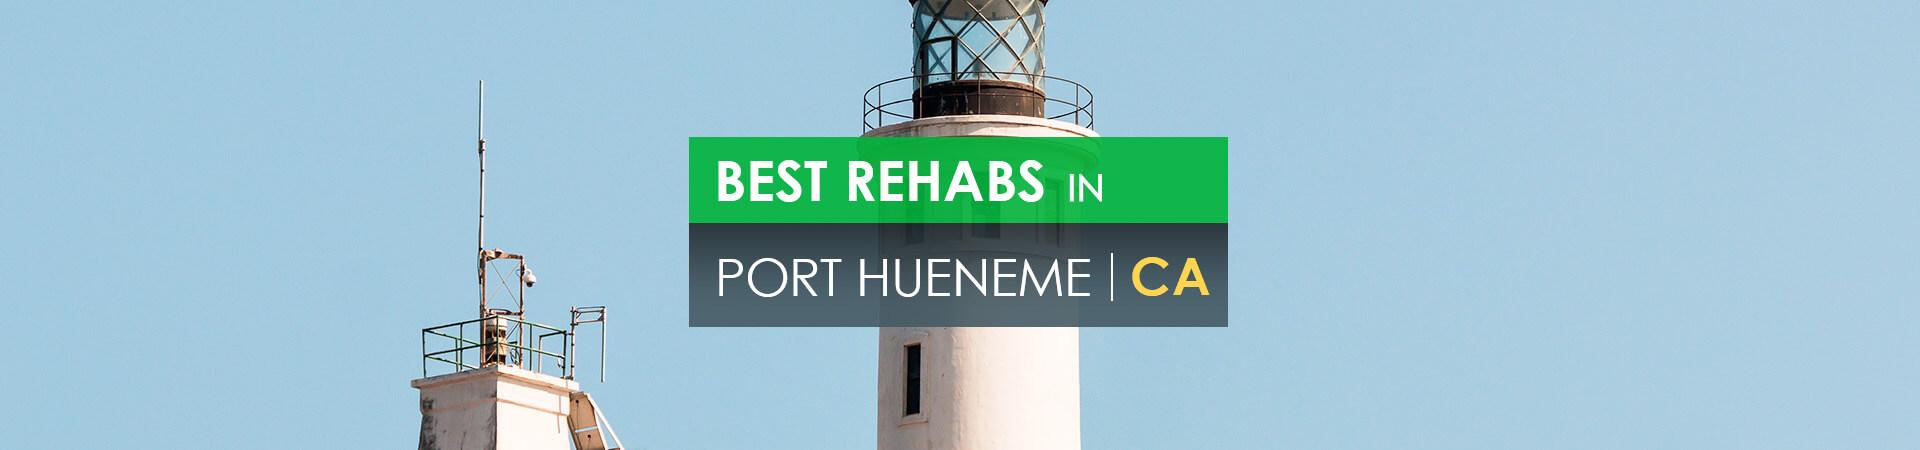 Best rehabs in Port Hueneme, CA